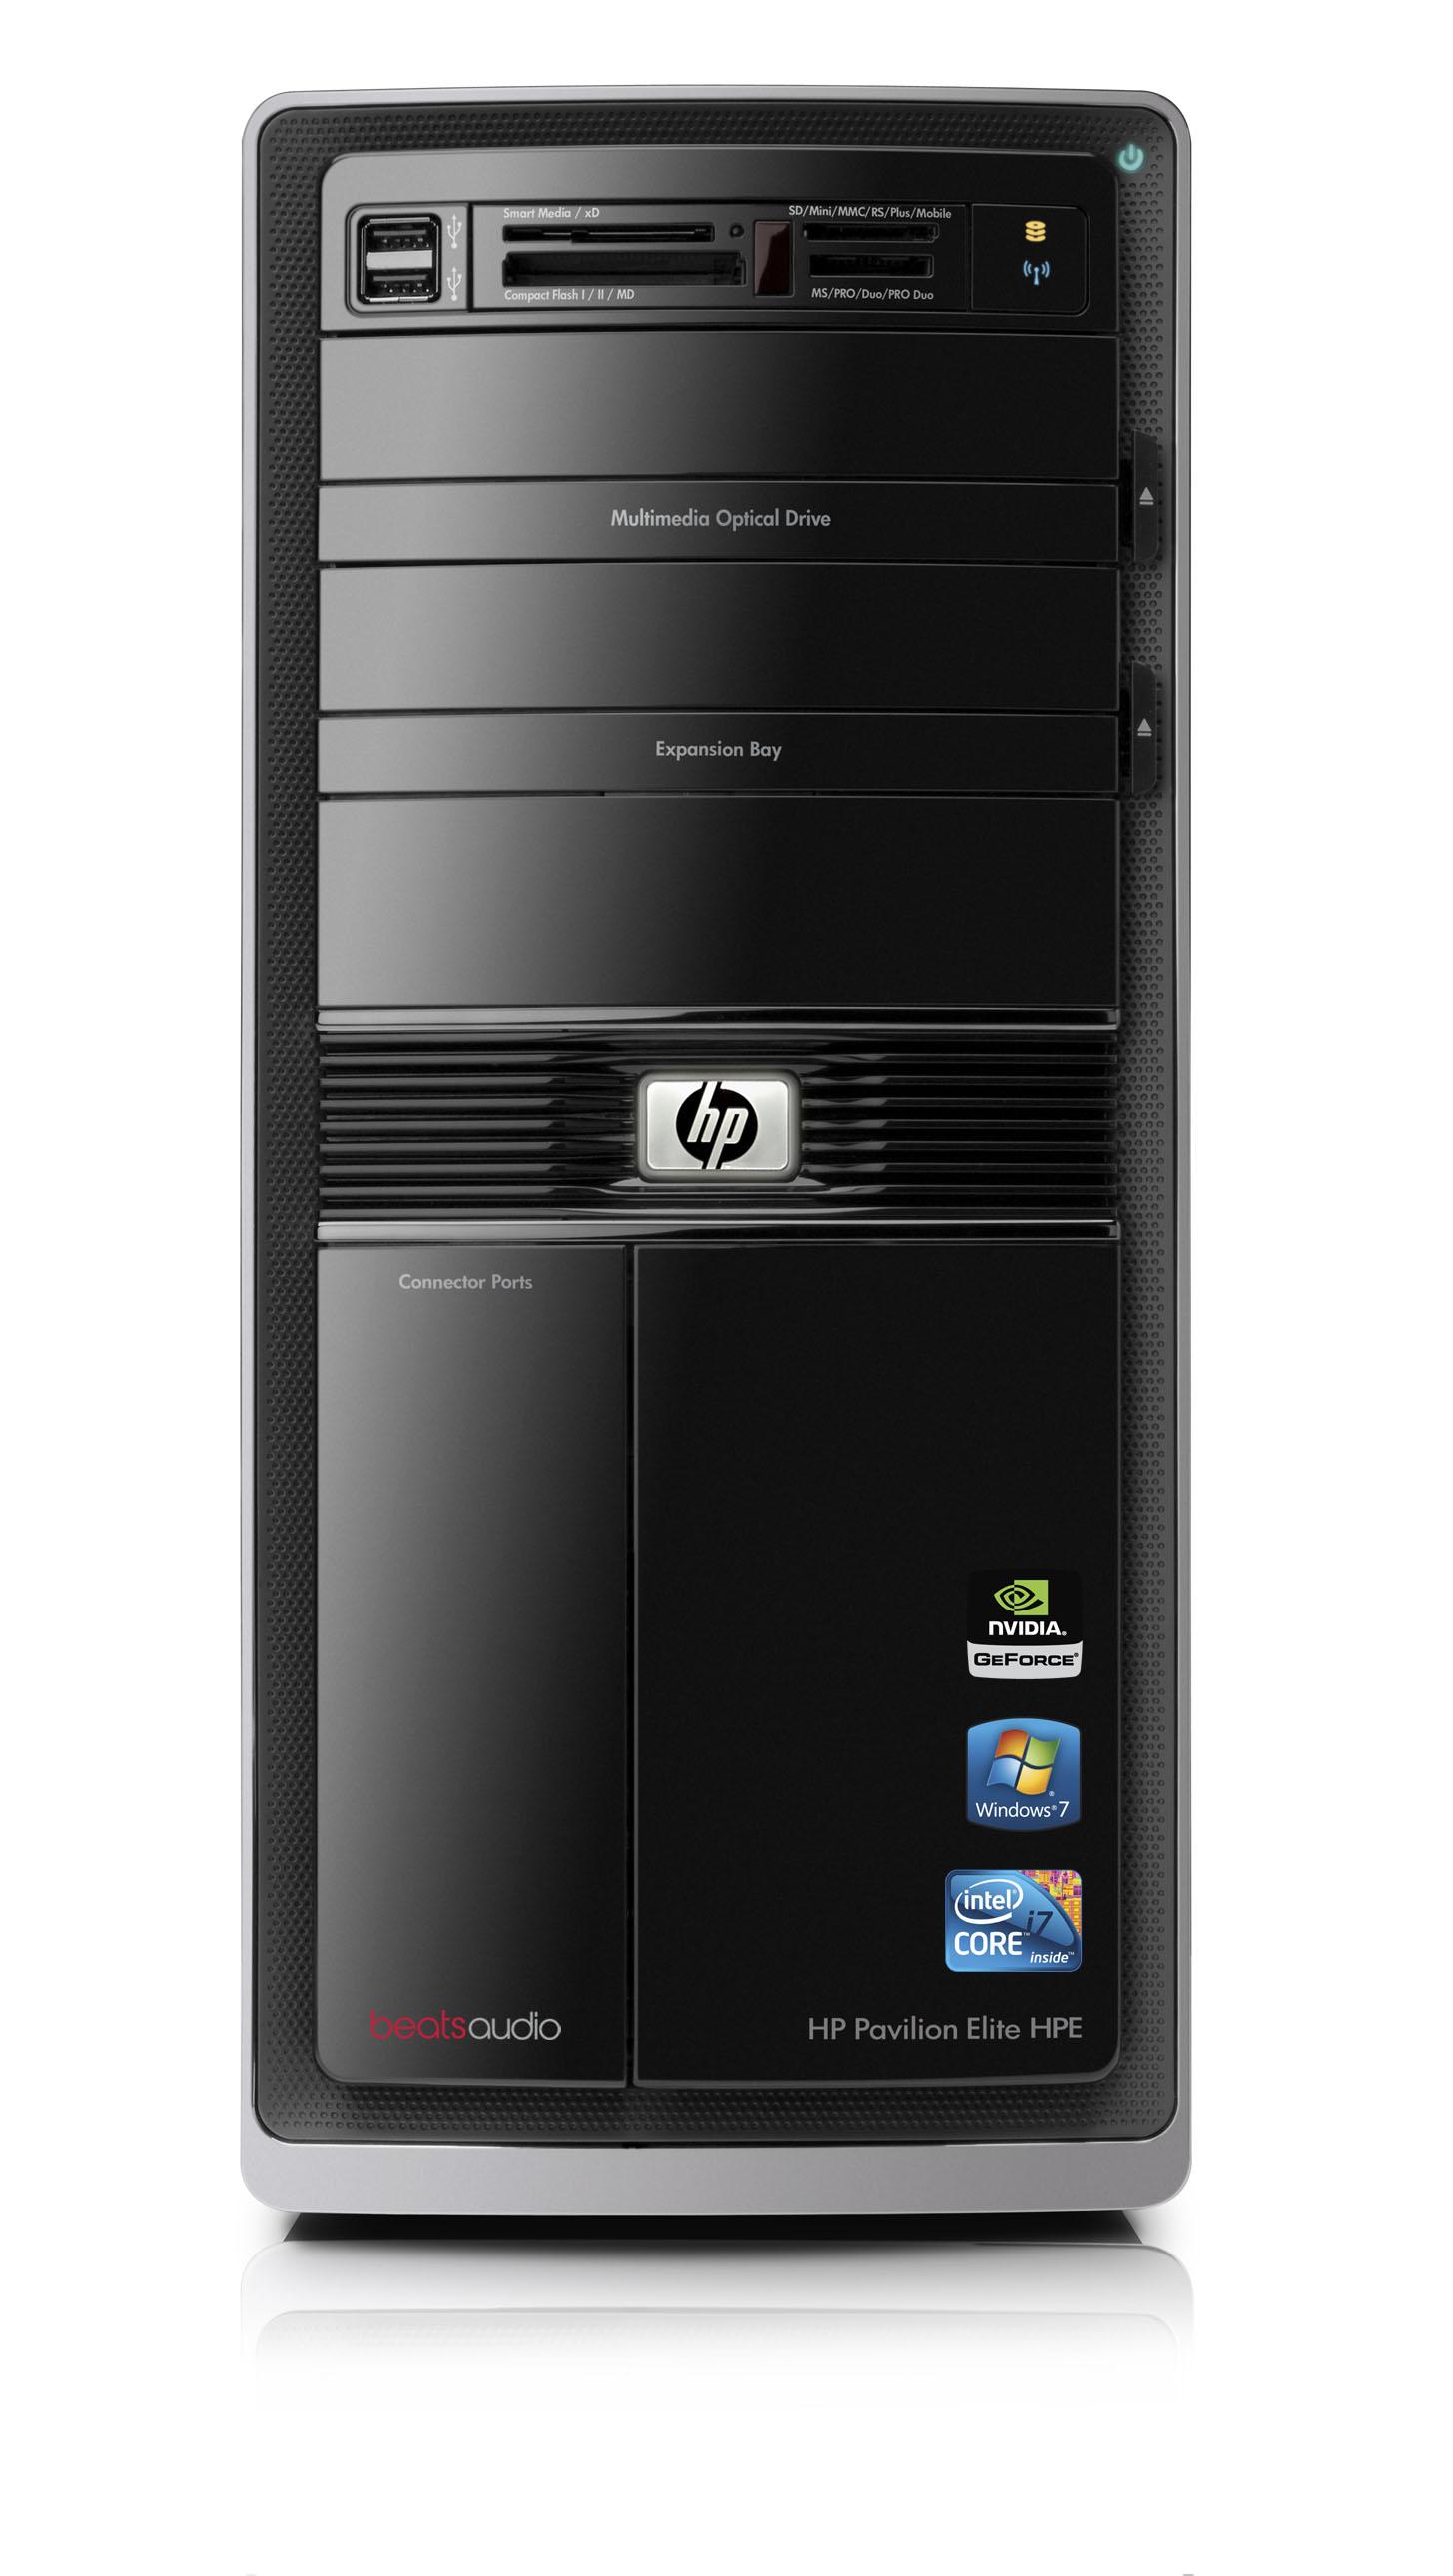 300 Hp Cars >> HP Pavilion PCs get Intel/AMD refresh plus Radeon graphics - SlashGear